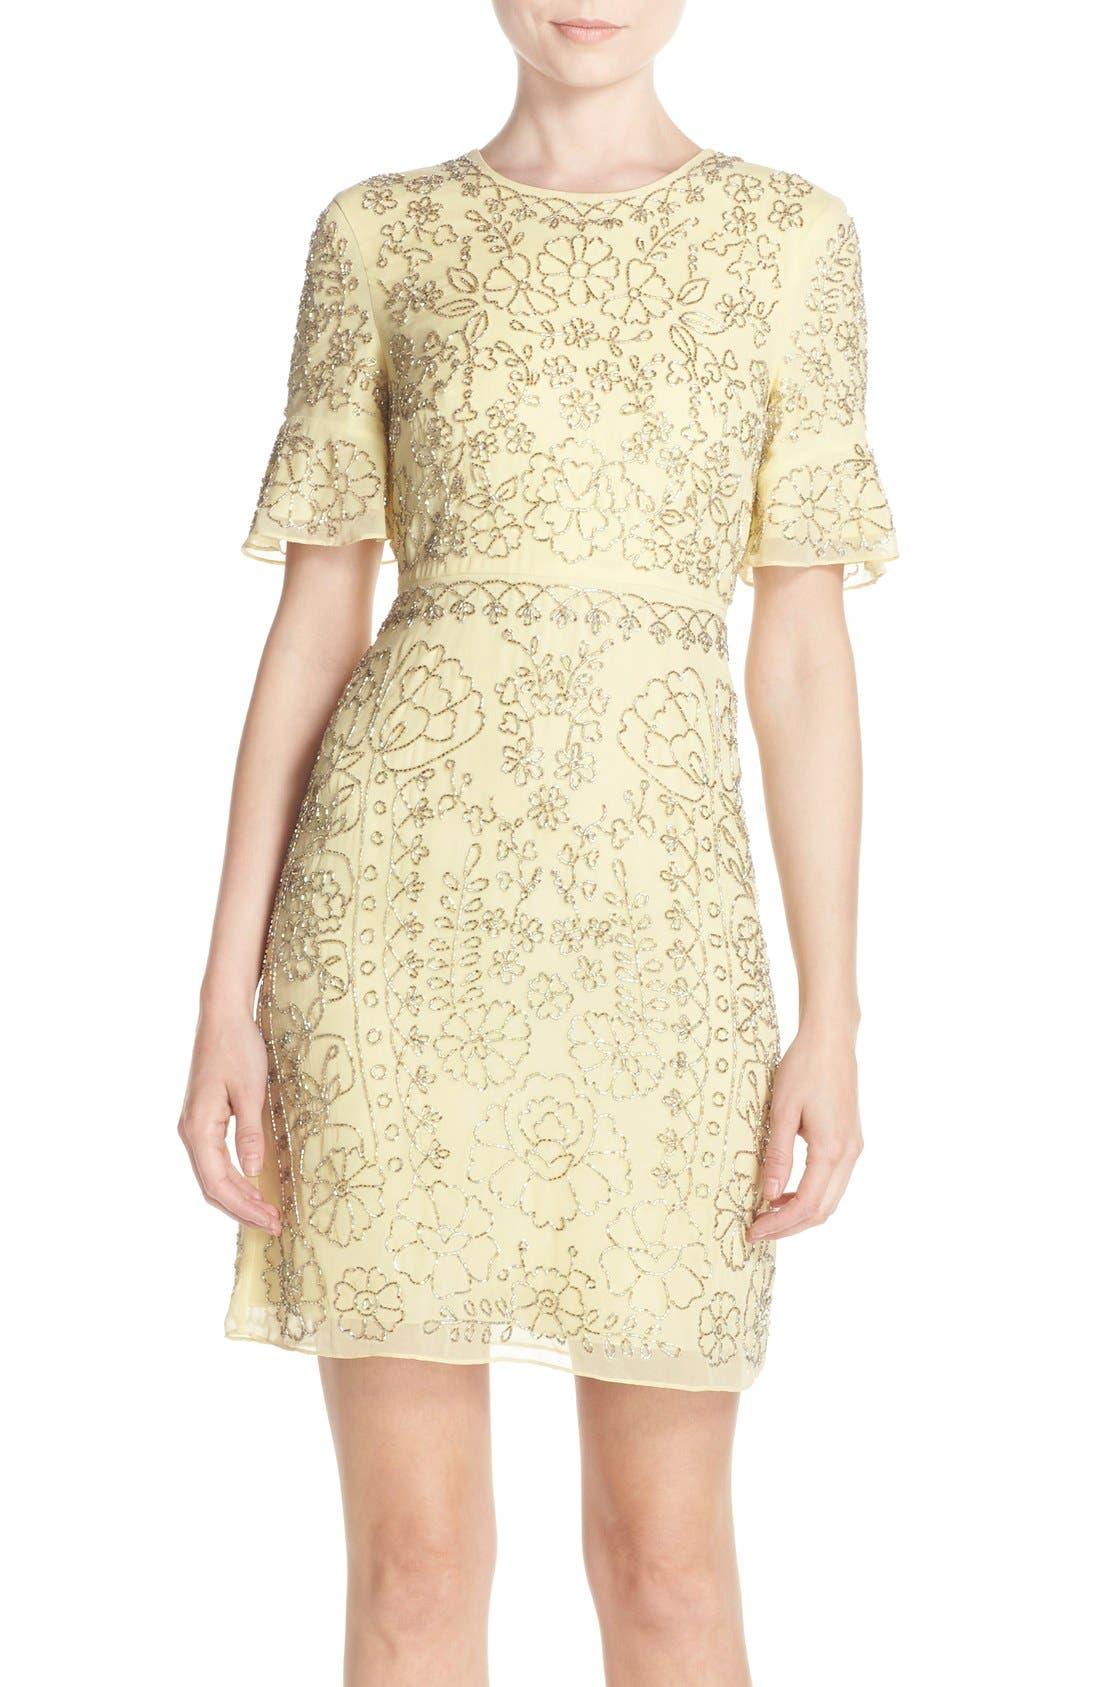 Alternate Image 1 Selected - Needle & Thread Beaded Georgette Sheath Dress